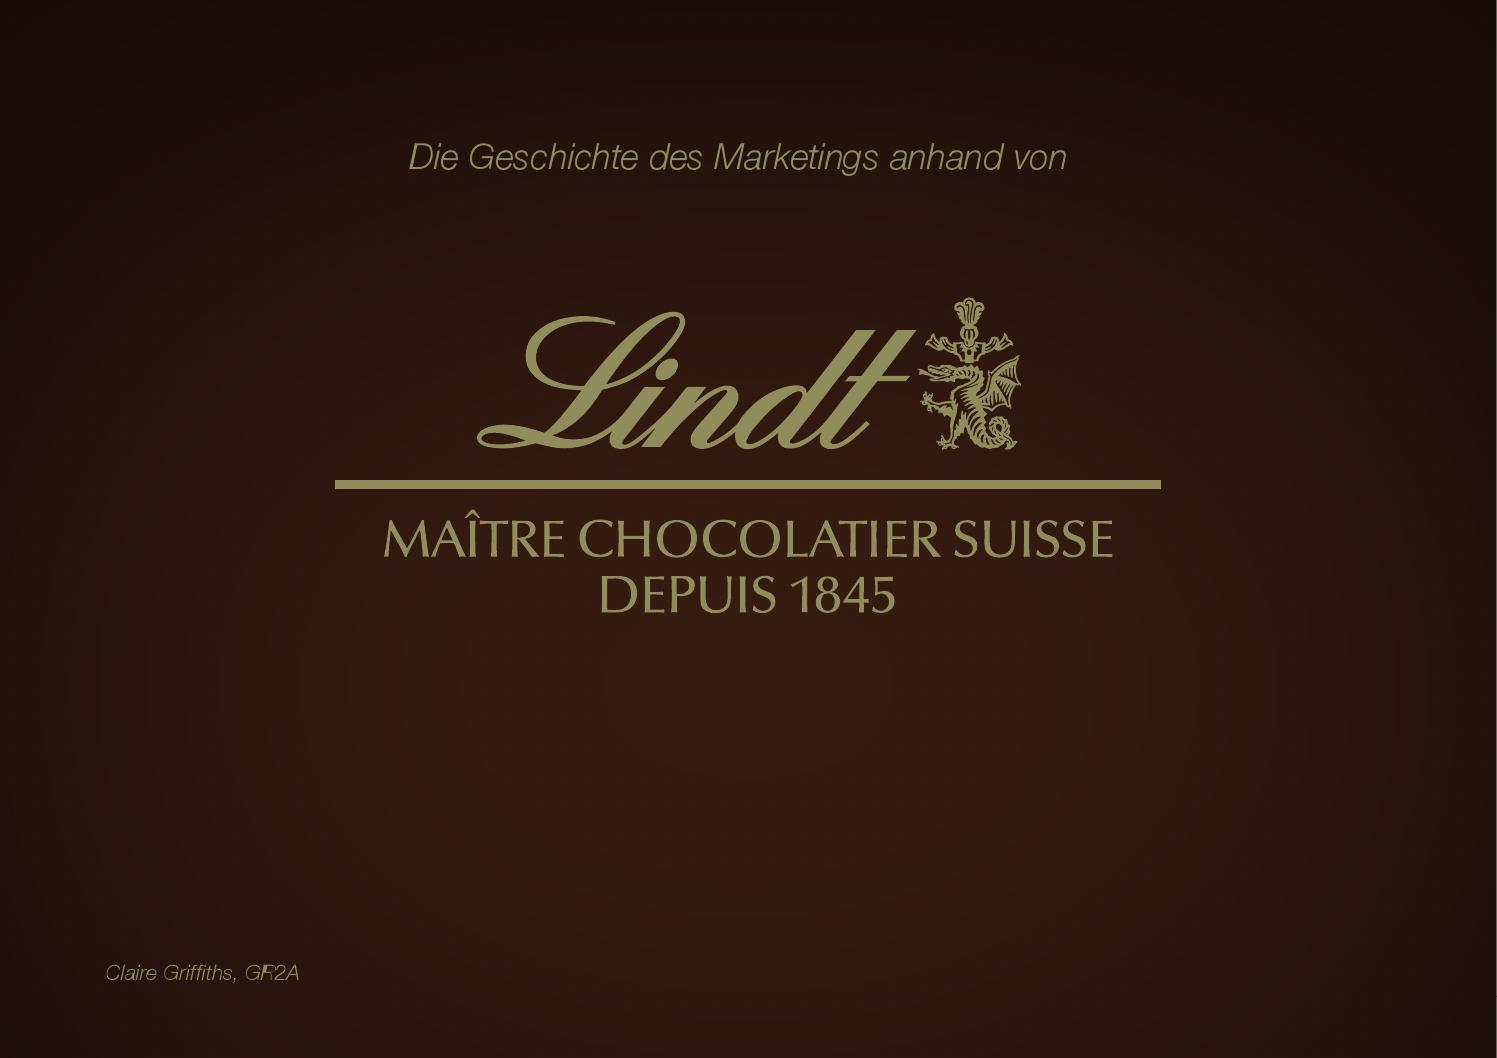 Geschichte des Marketings by Claire Griffiths  Issuu